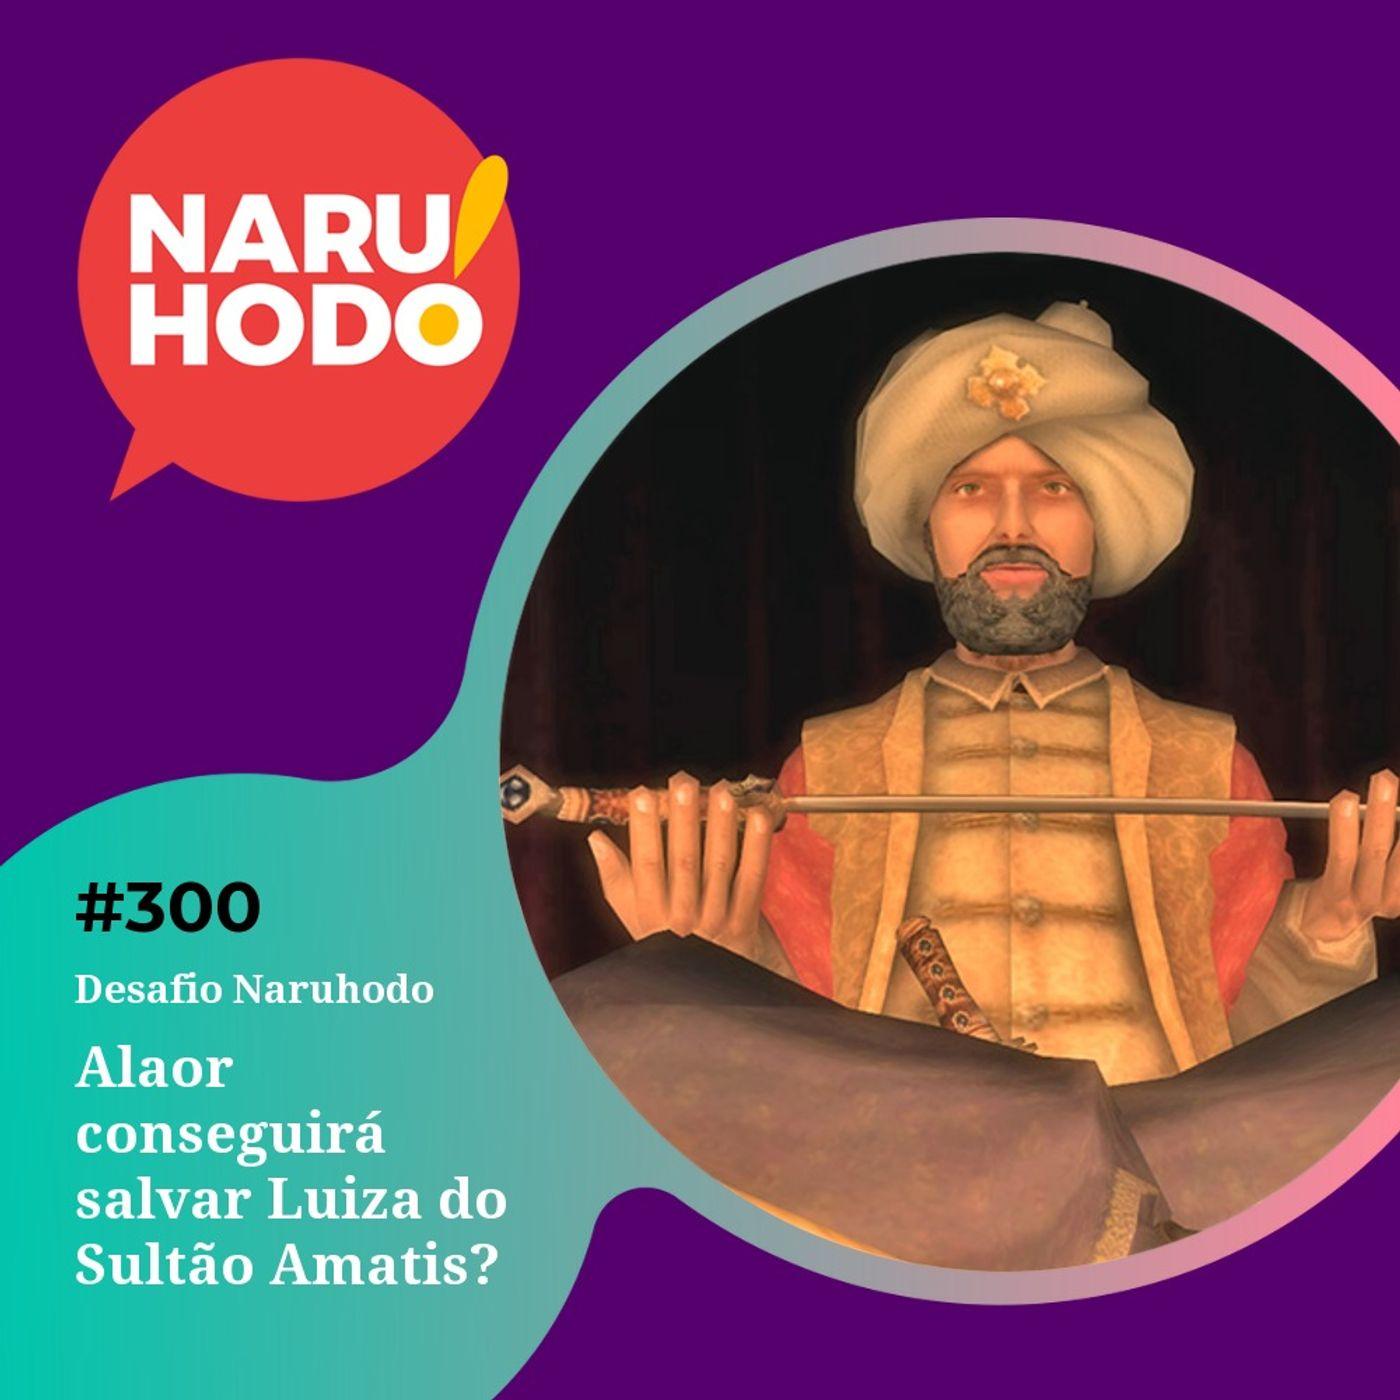 Naruhodo #300 - Desafio Naruhodo: Alaor conseguirá salvar Luíza do Sultão Amatis?